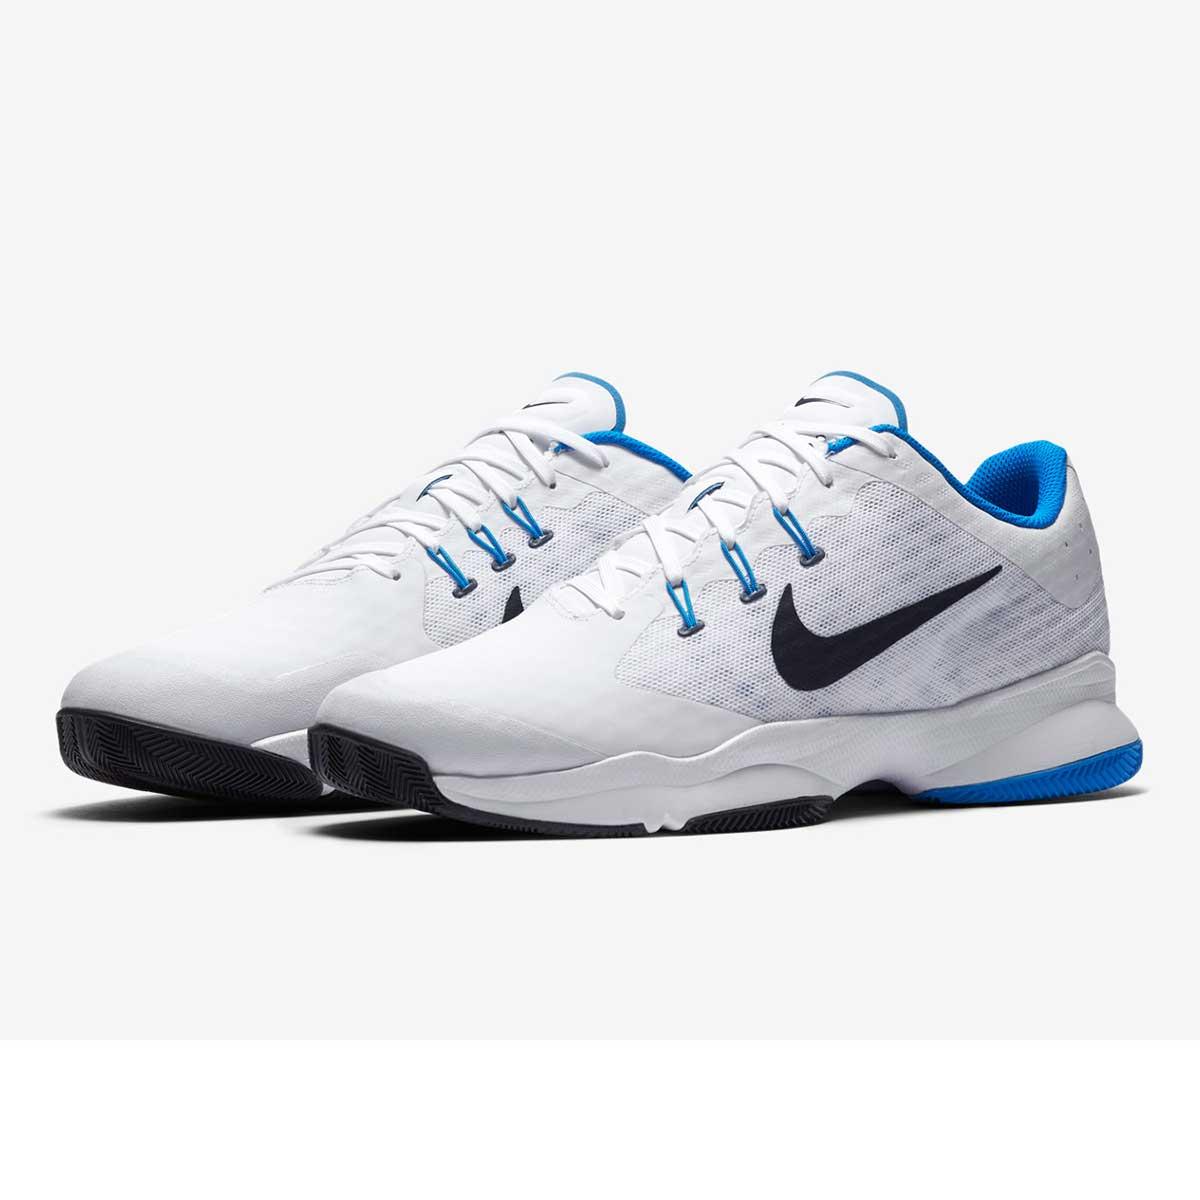 4e14de4a29c19 Buy Nike Air Zoom Ultra Tennis Shoes (White Blue Obsidian) Online